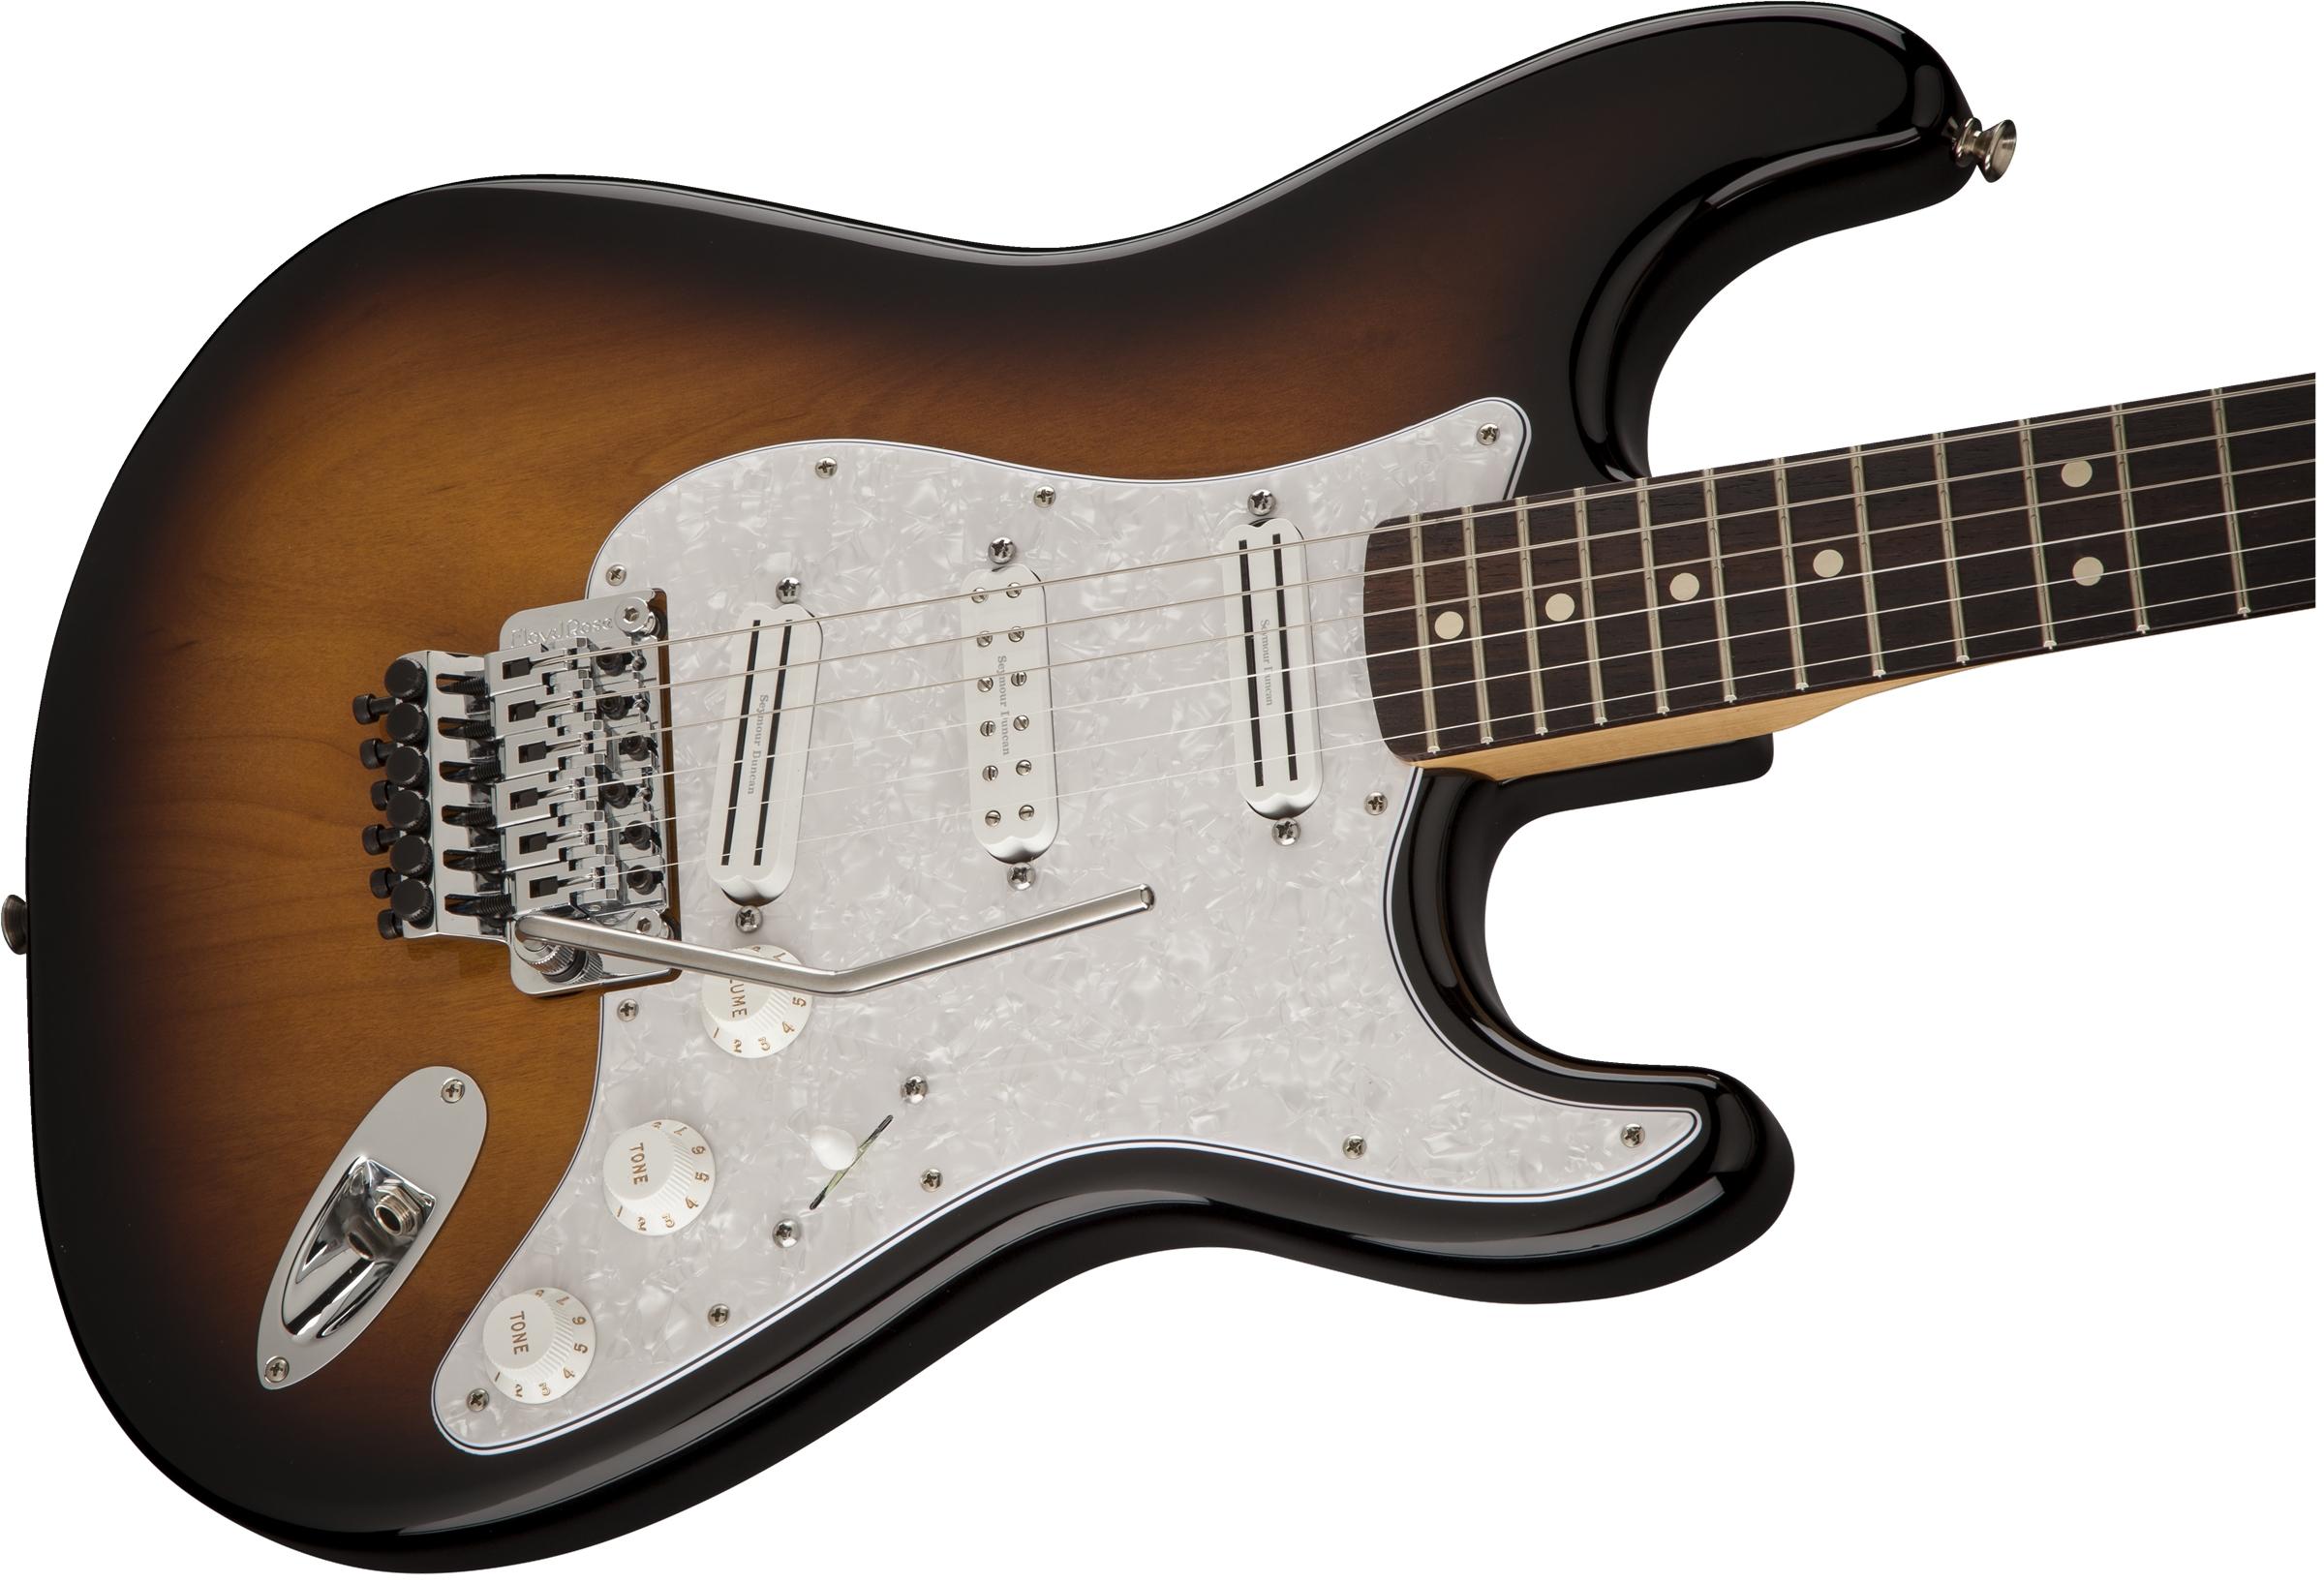 Contemorary Japanese Fender Hss Stratocaster Wiring Diagram ...